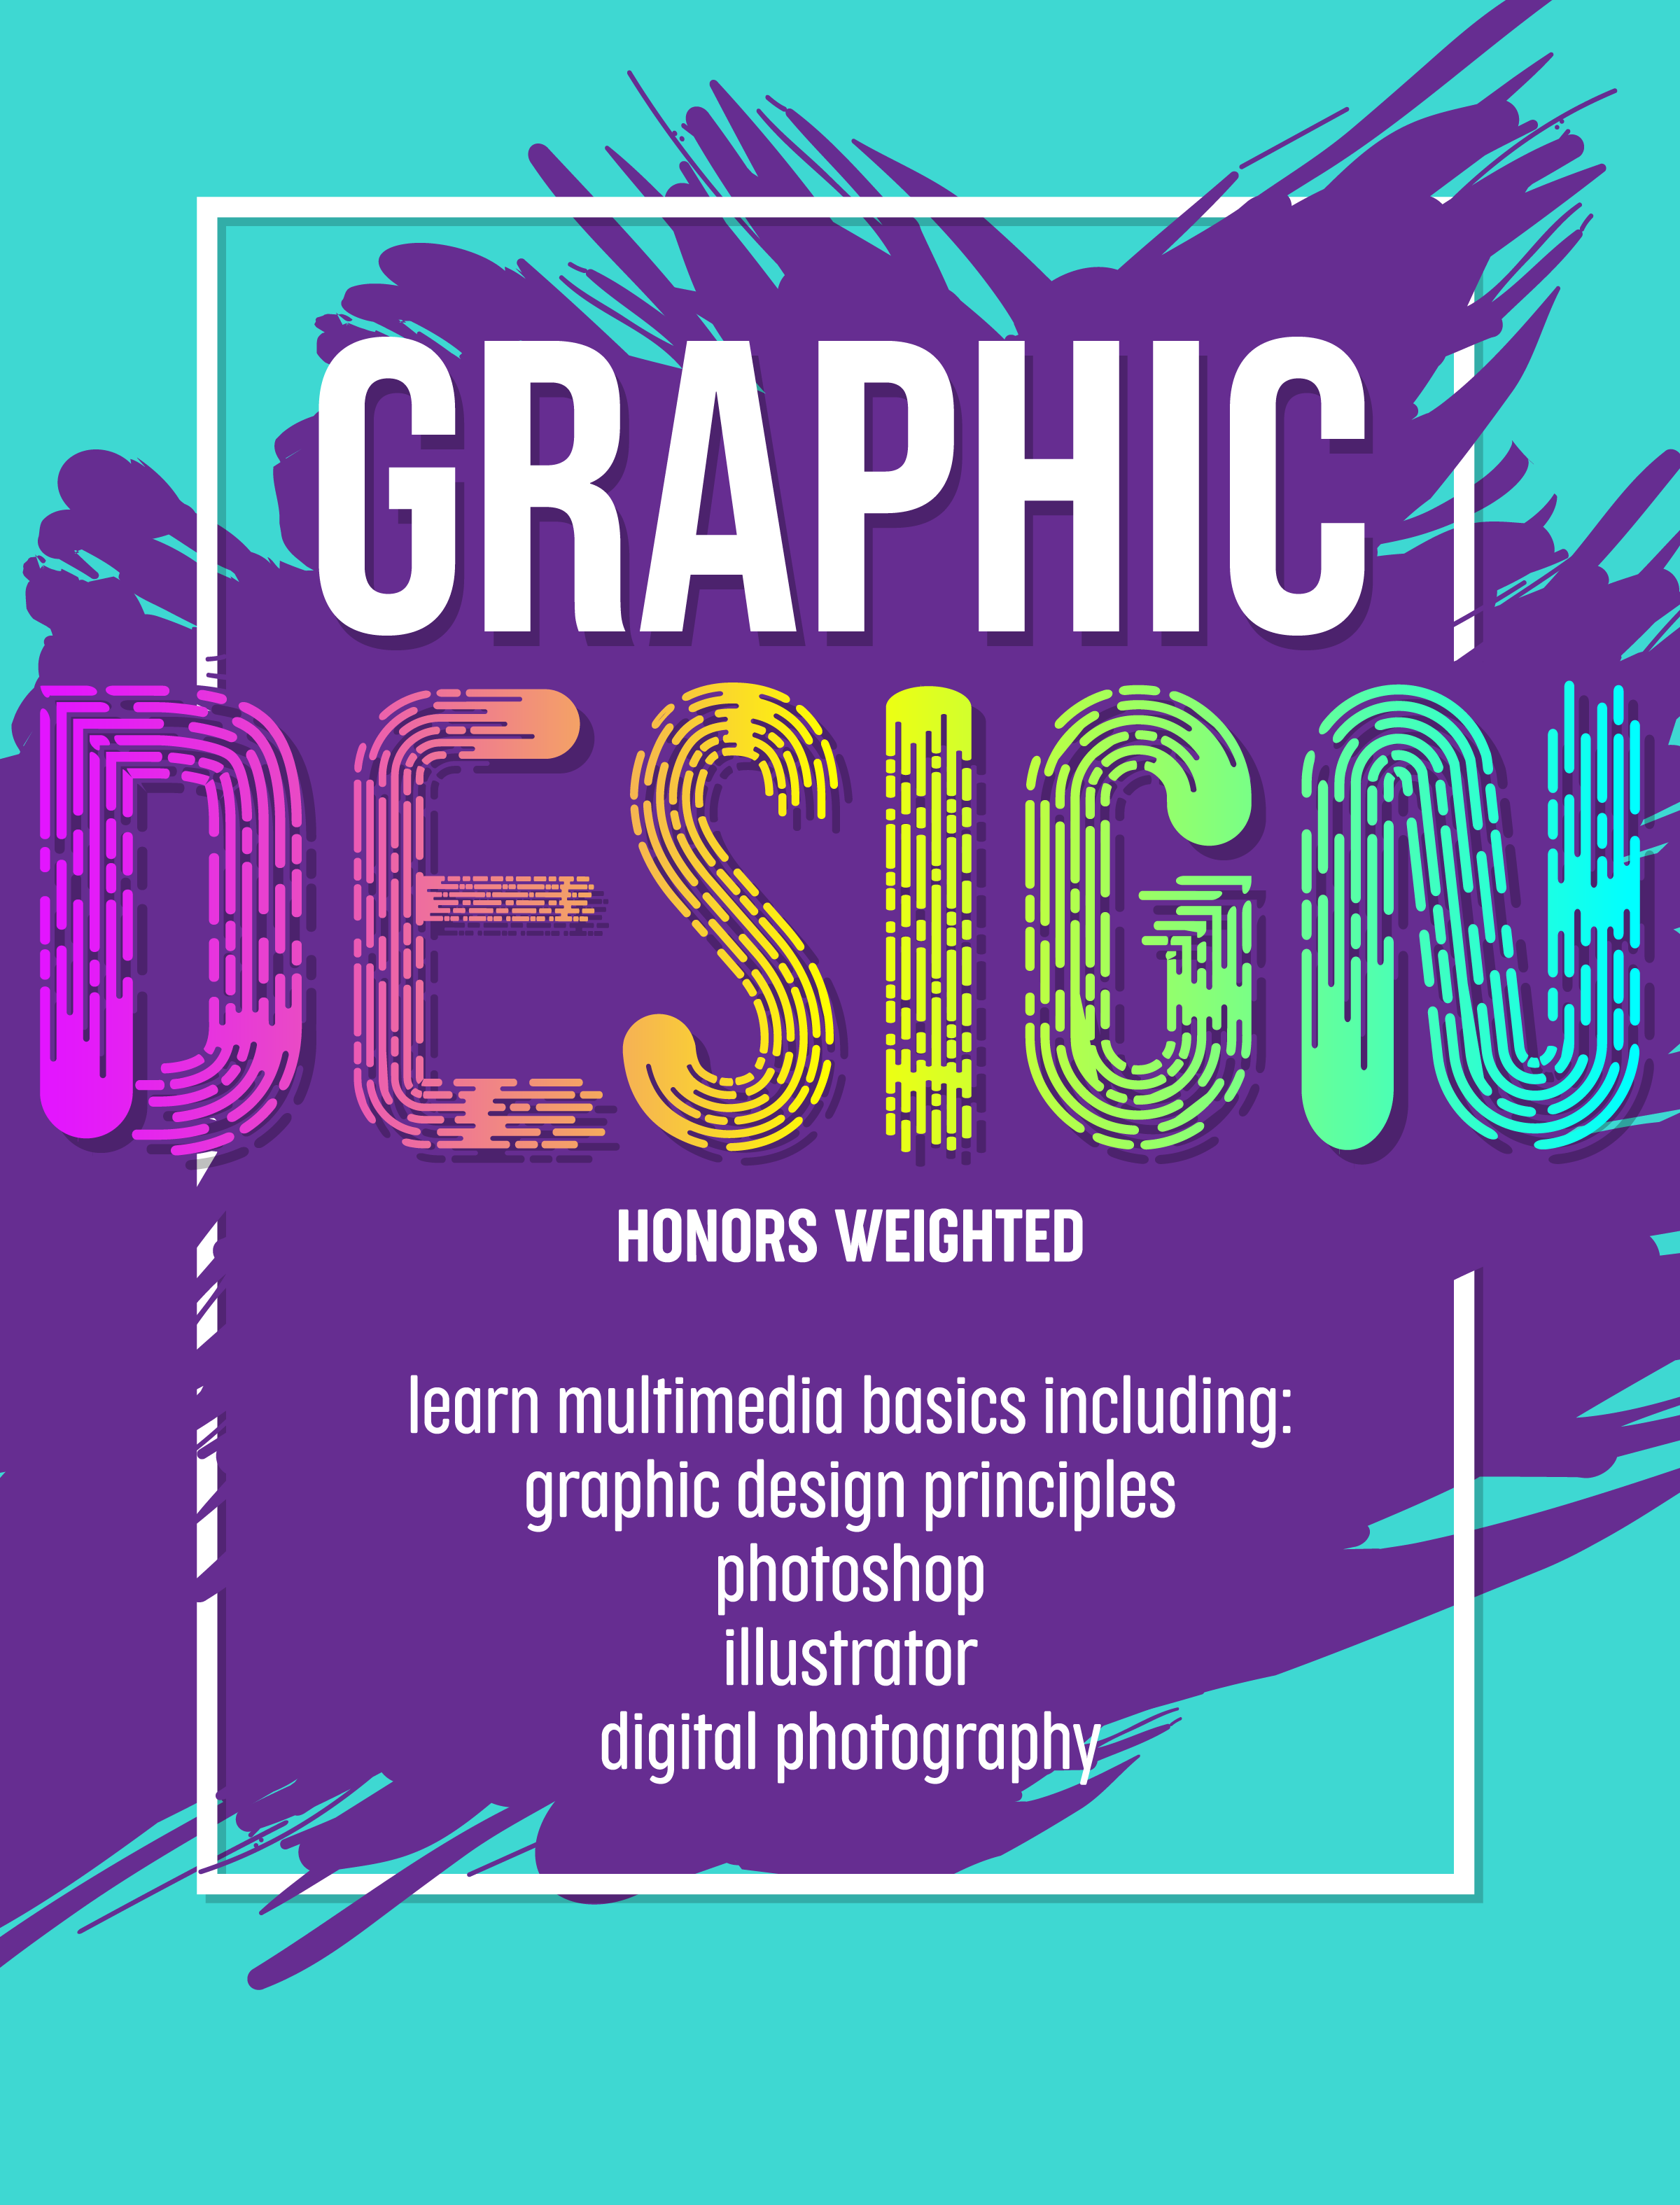 Sandoval_GraphicDesignAd-01